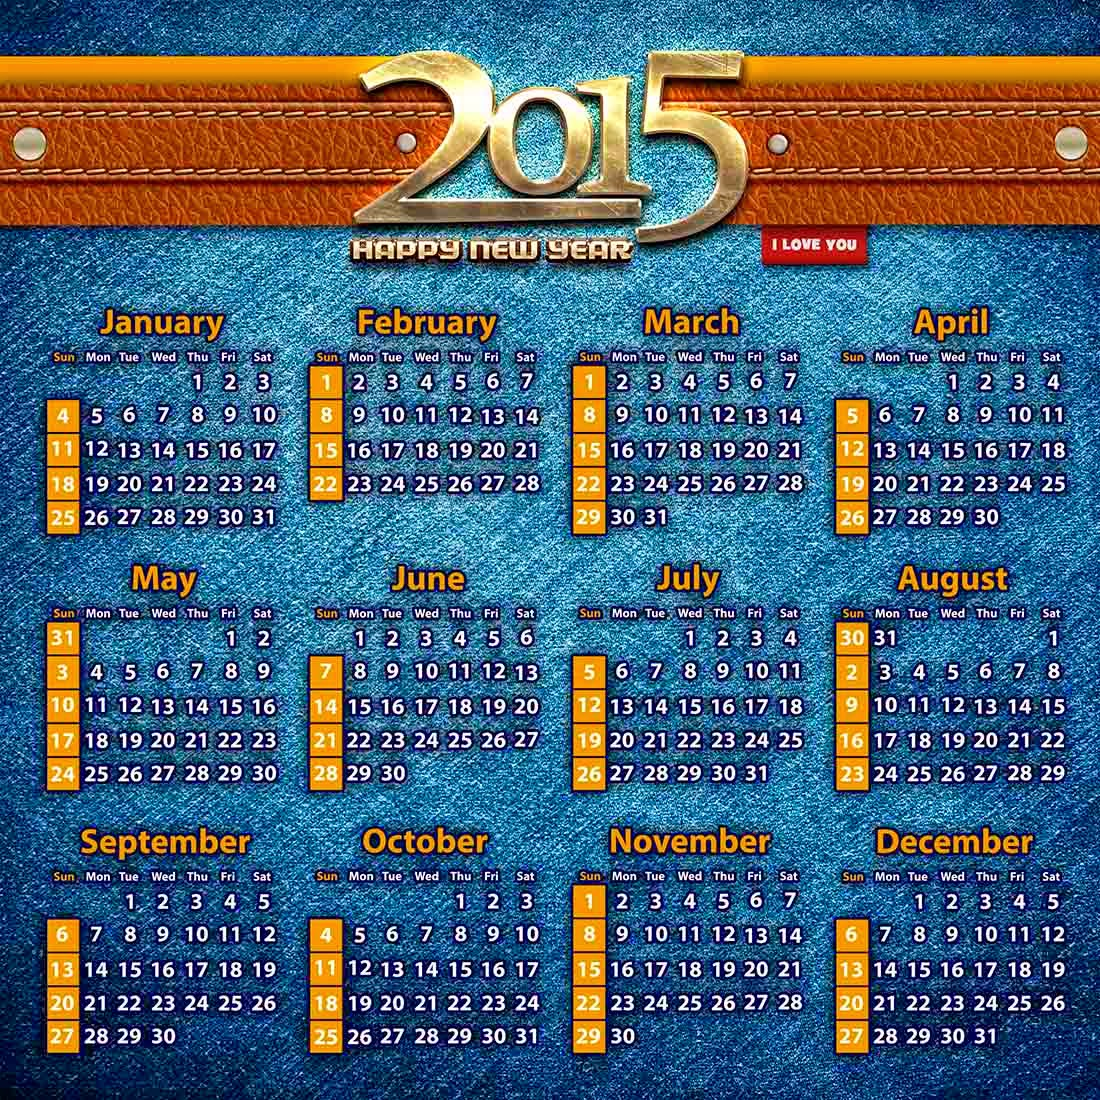 Textura de mezclilla con banda de cuero para un bonito calendario 2015